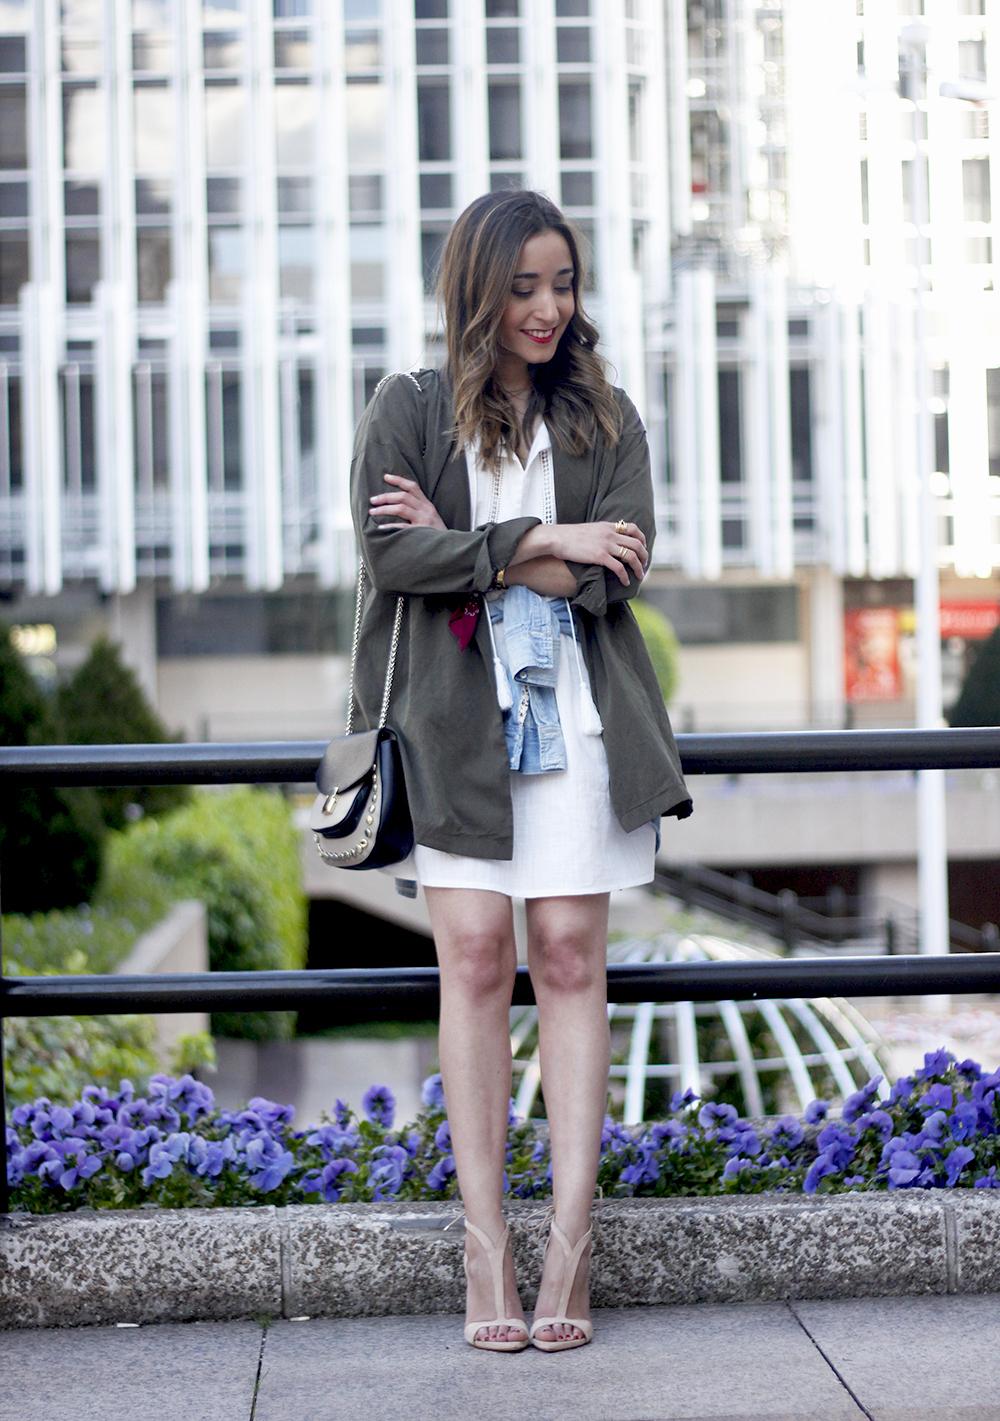 White Dress khaki shirt denim shirt nude sandals bandana outfit spring style05